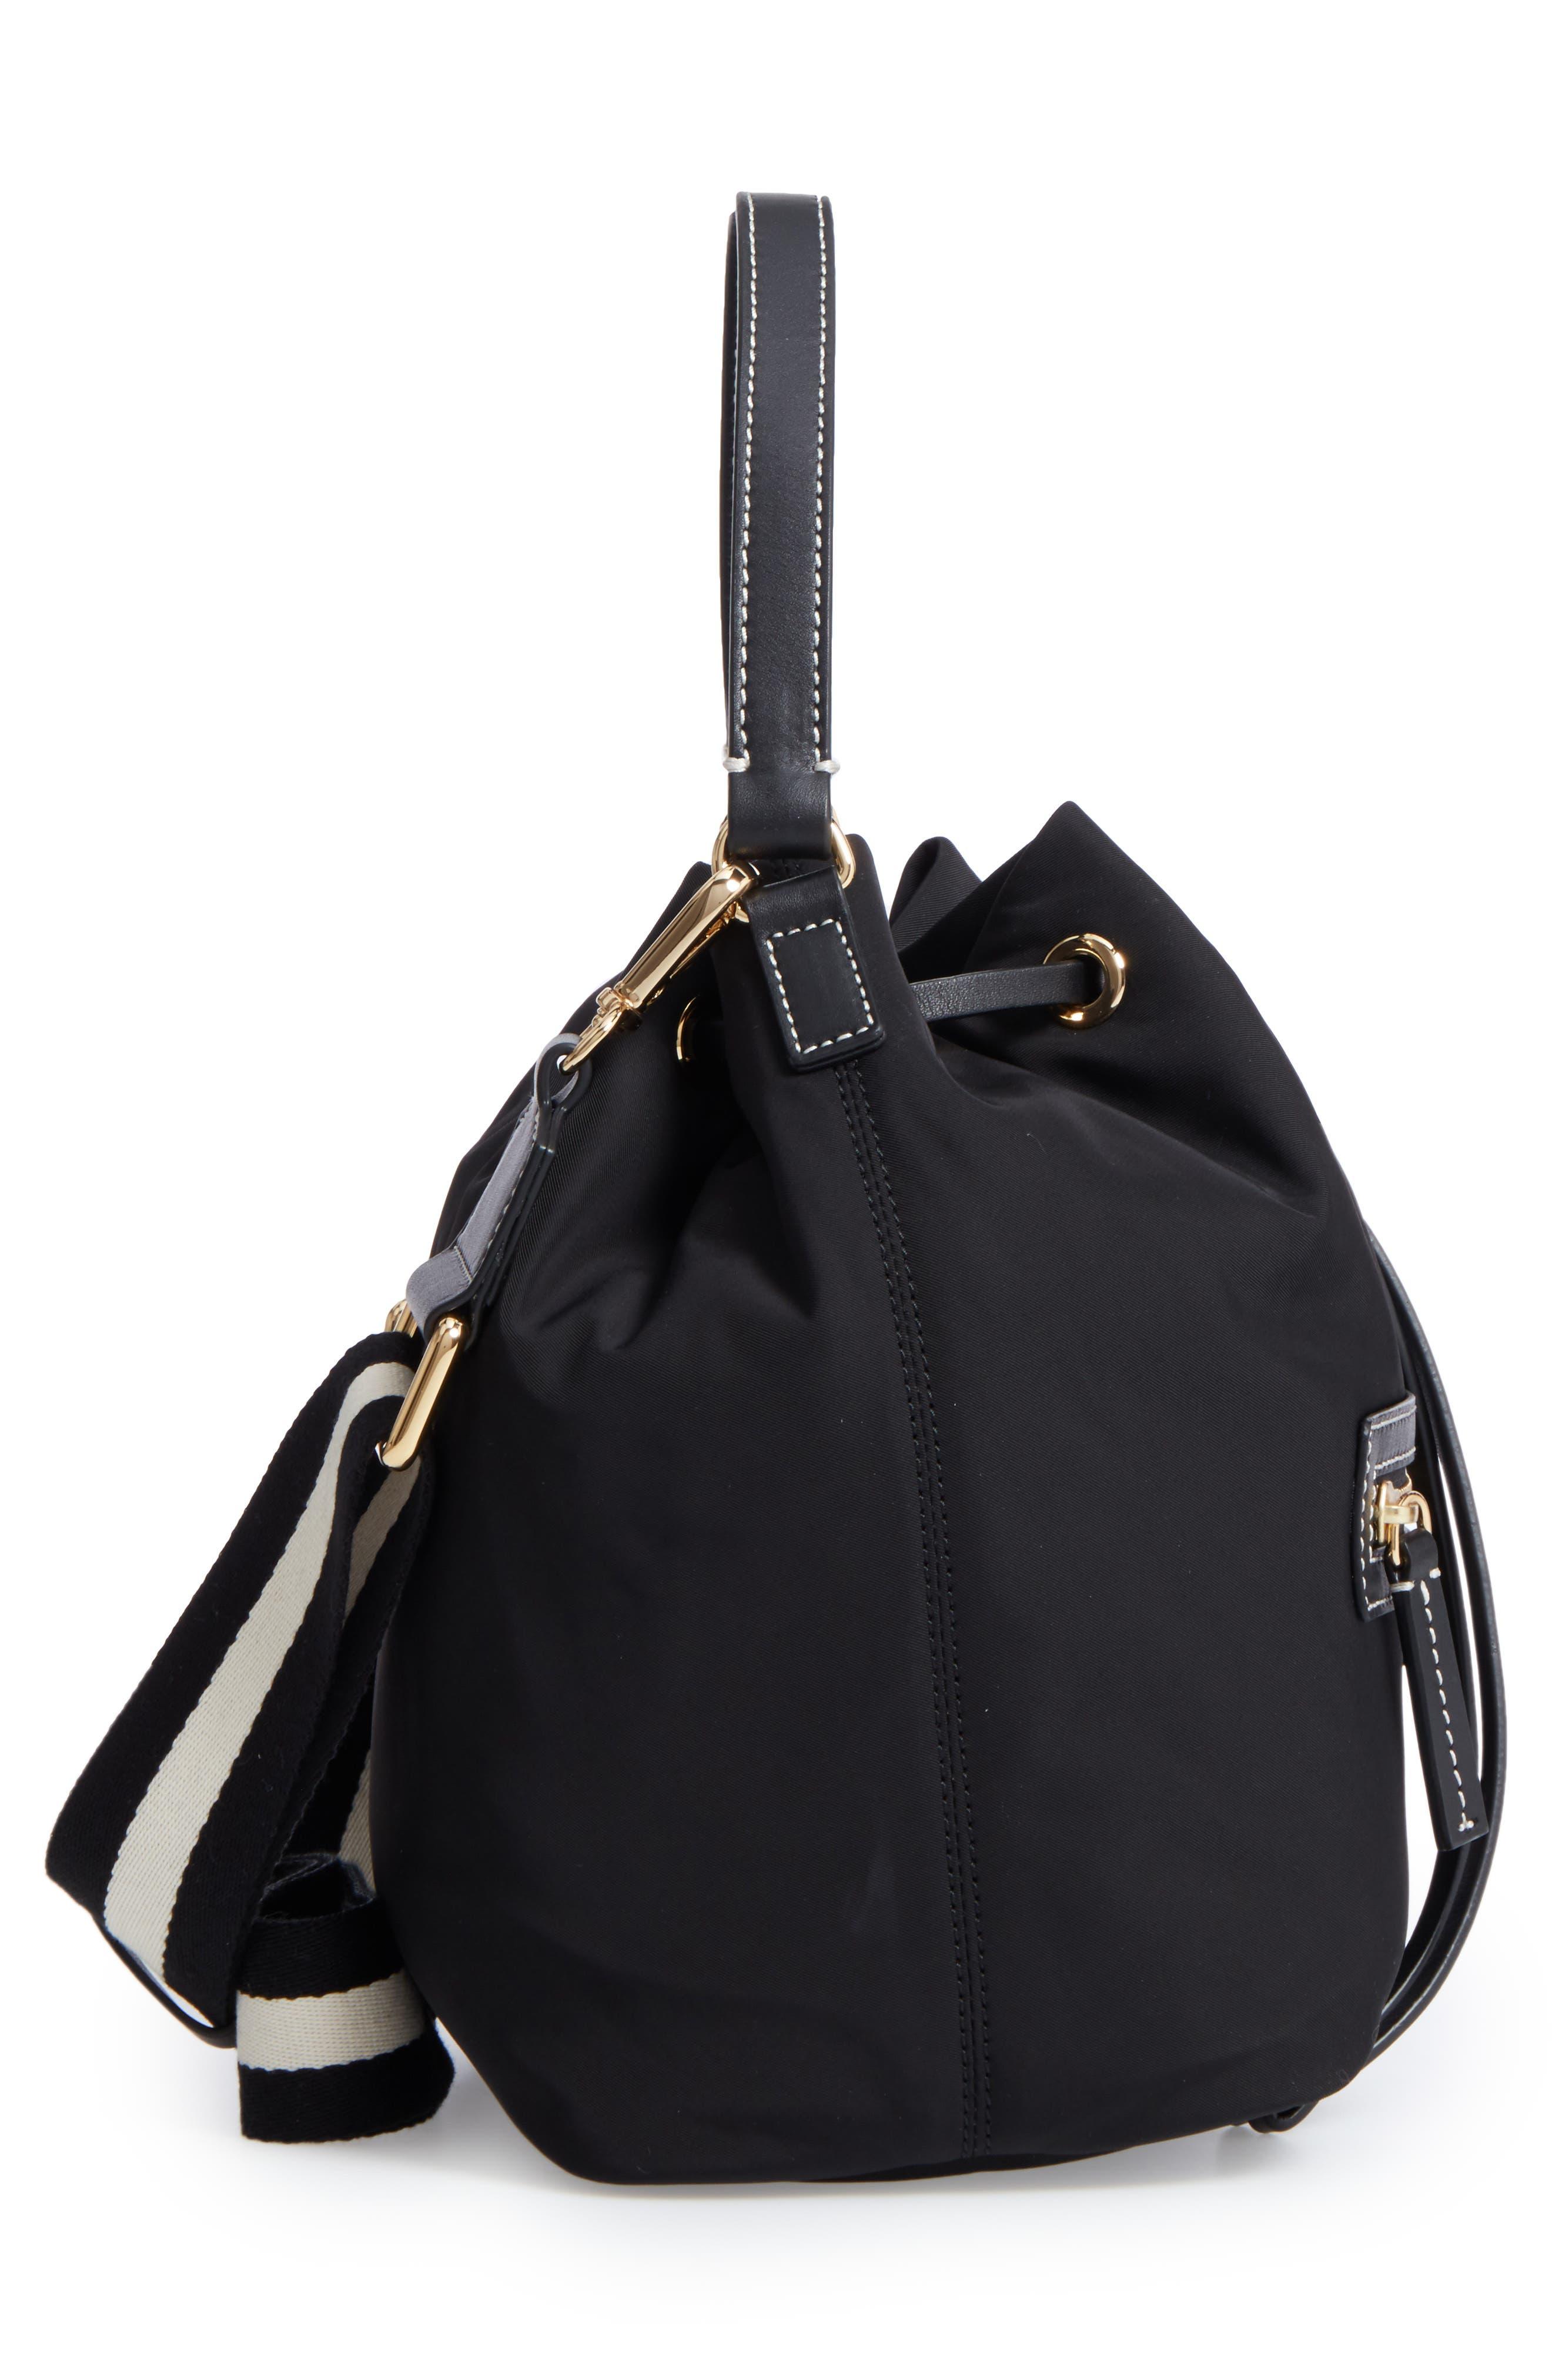 Medium Ann Nylon Bucket Bag,                             Alternate thumbnail 5, color,                             001